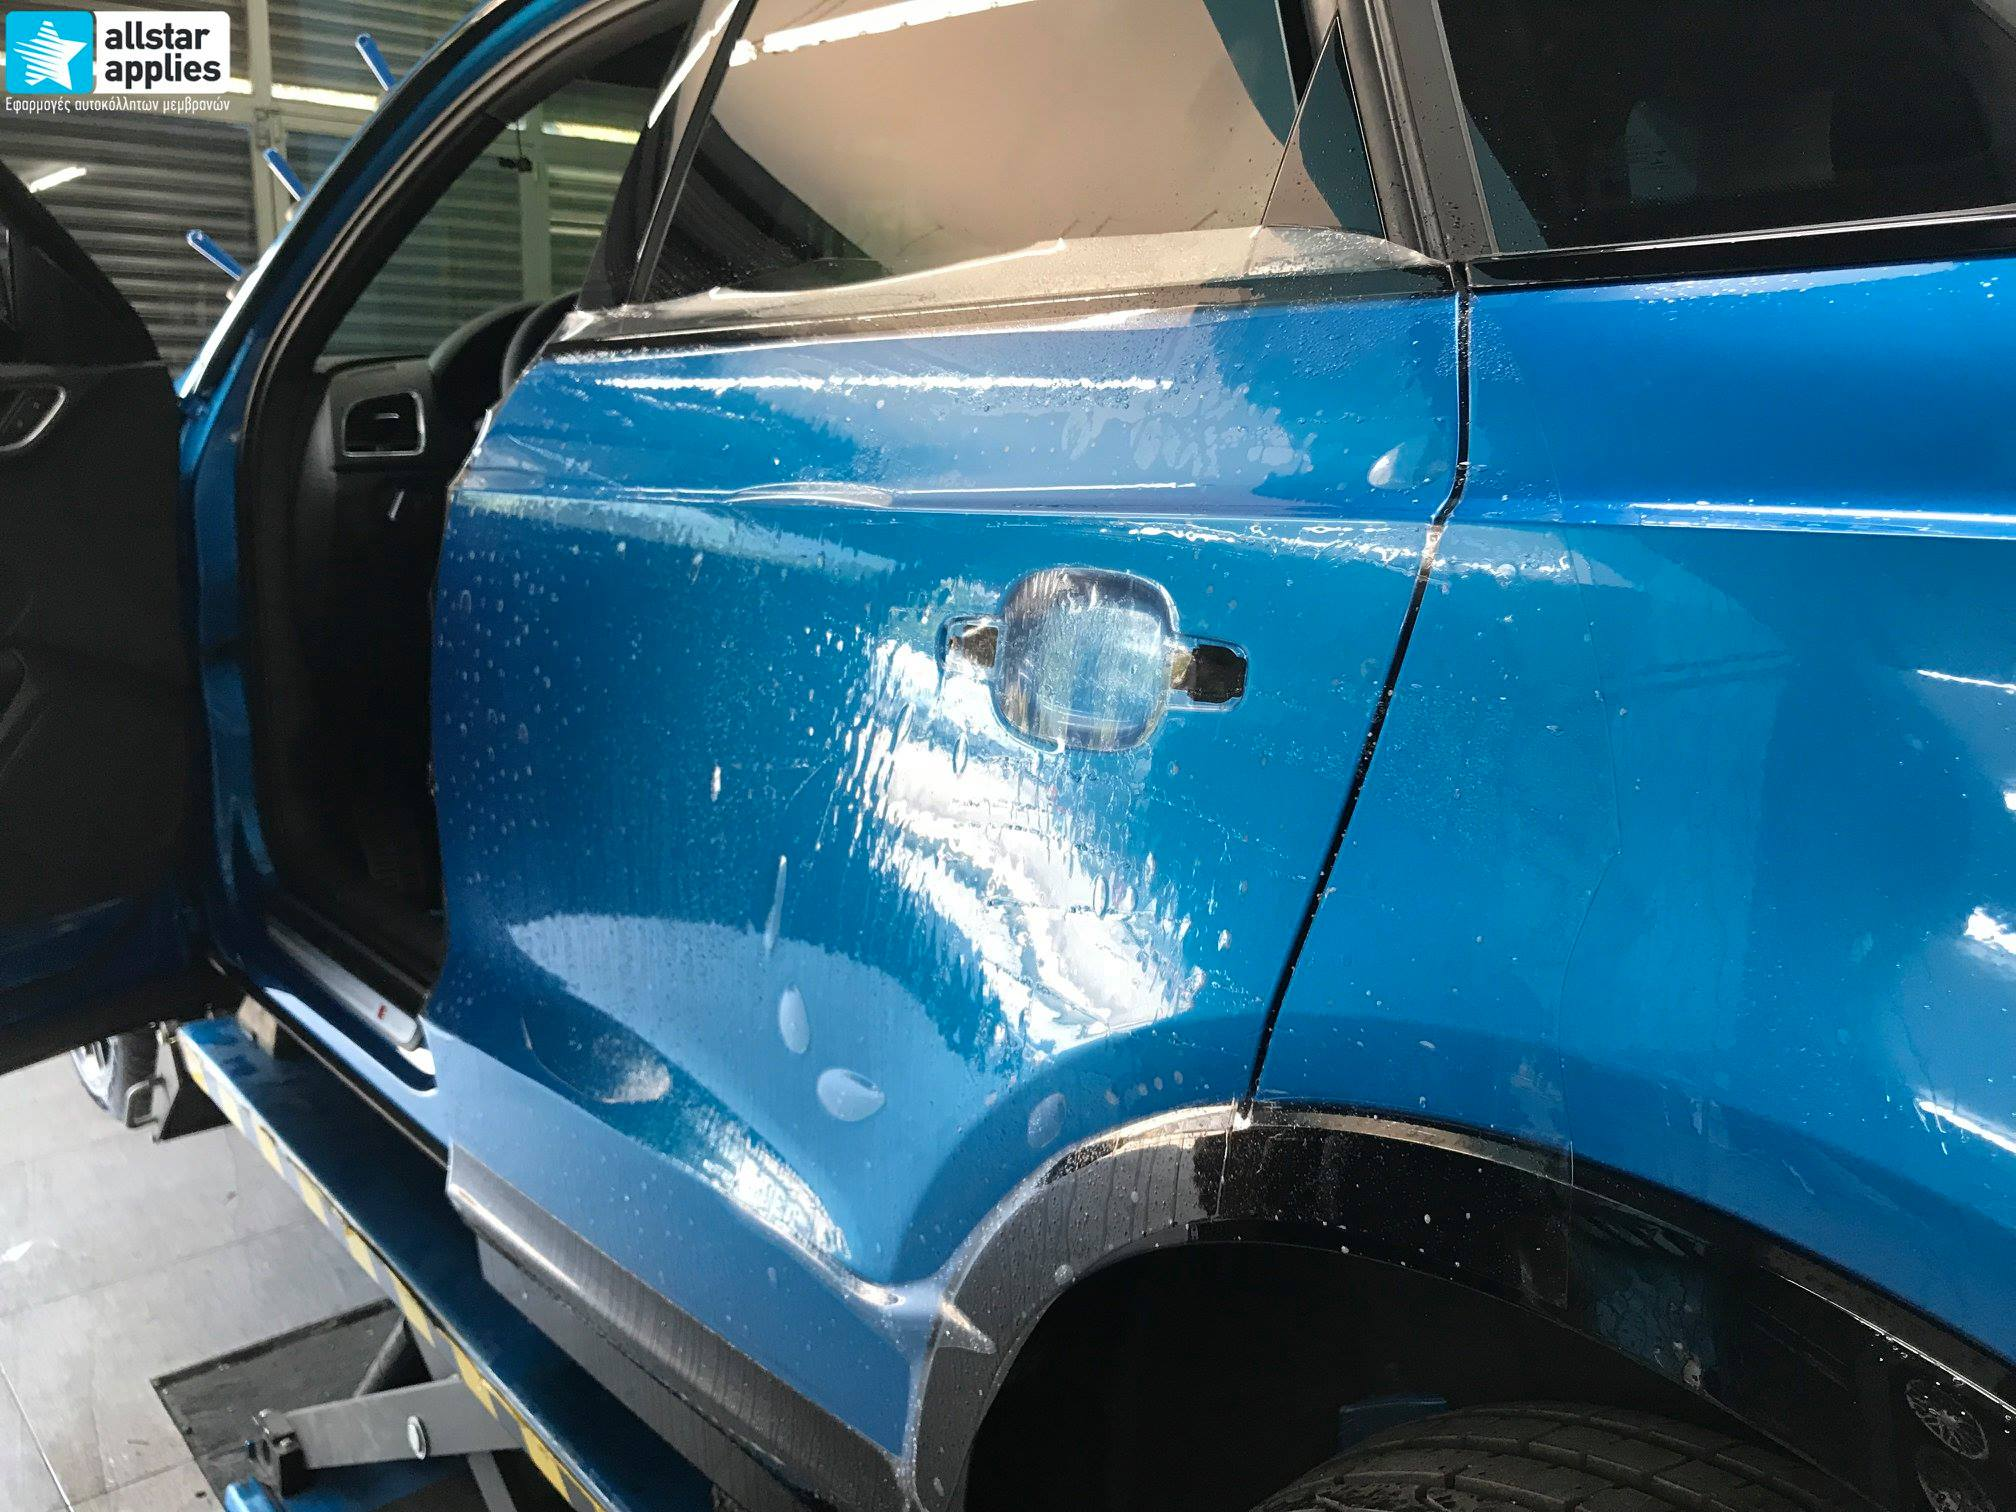 Audi Q3 – Μεμβράνες προστασίας χρώματος (Full Paint Protection Film) (9)